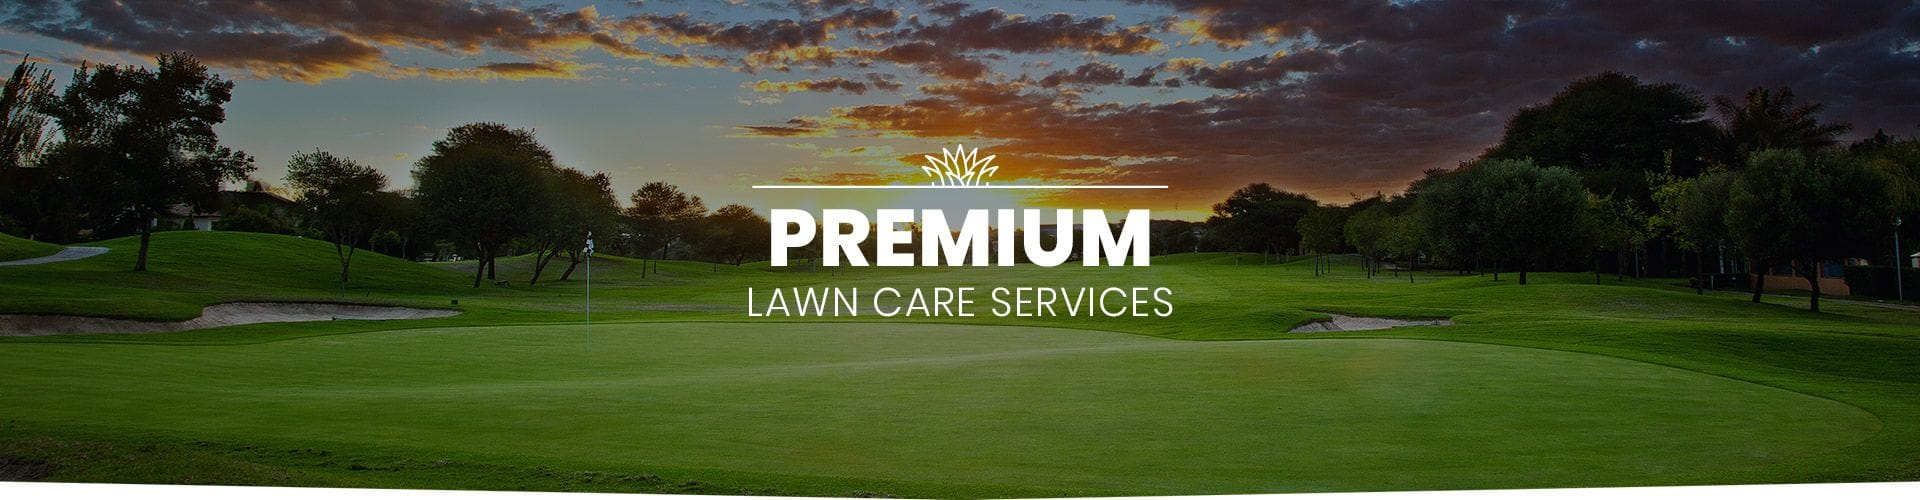 Premium Lawn Care Services Geelong & Bellarine Peninsula